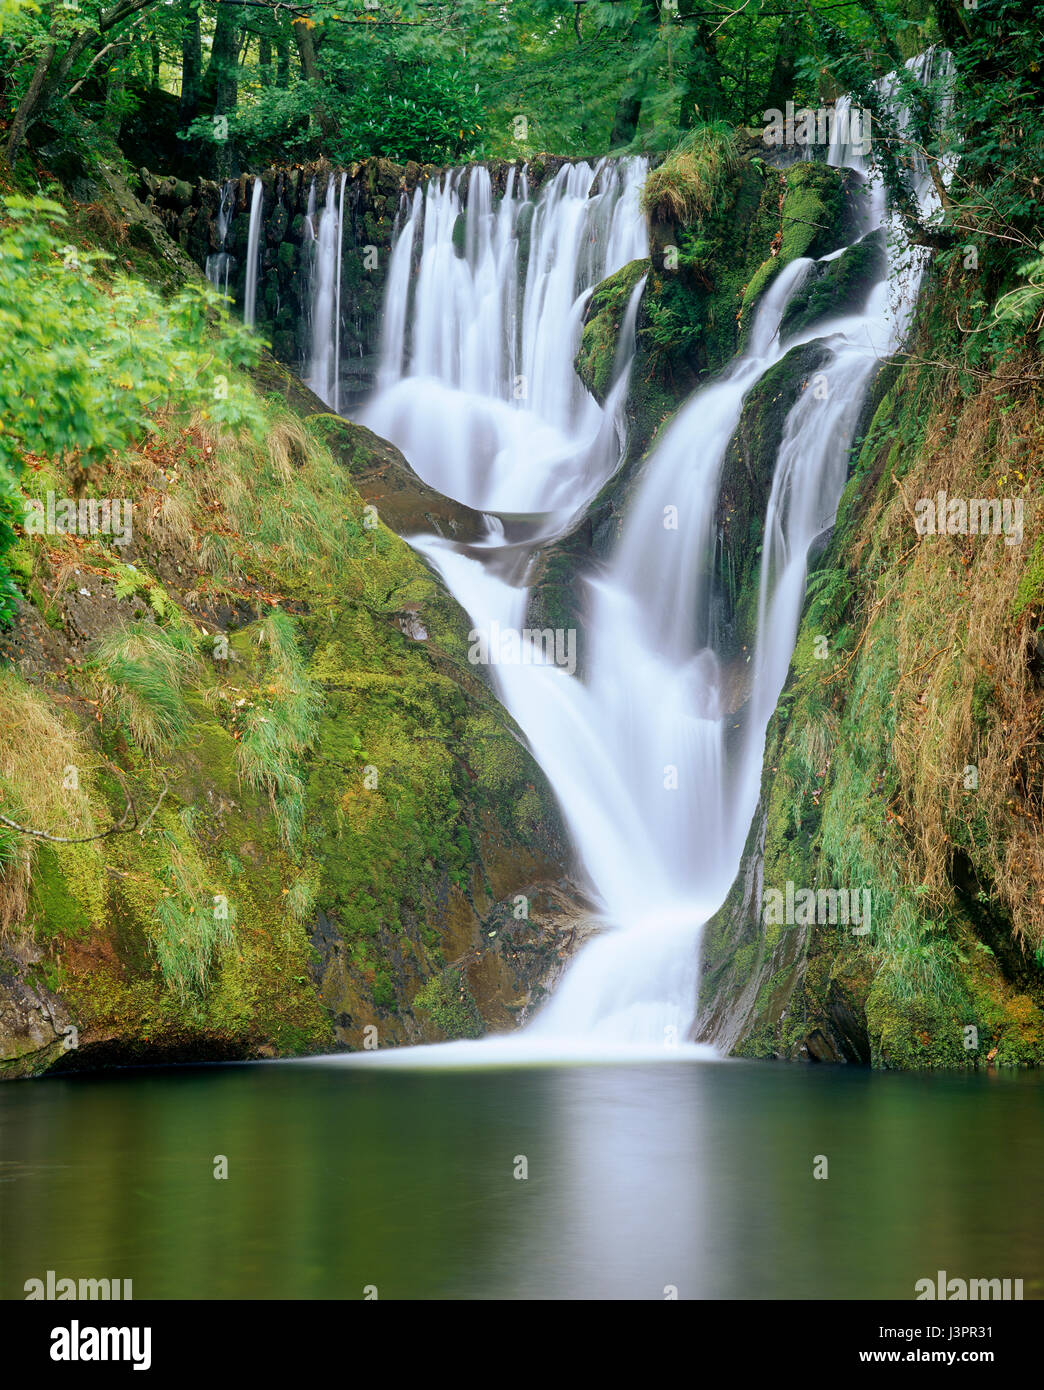 Furnace Falls, Dyfed, North Wales, UK - Stock Image